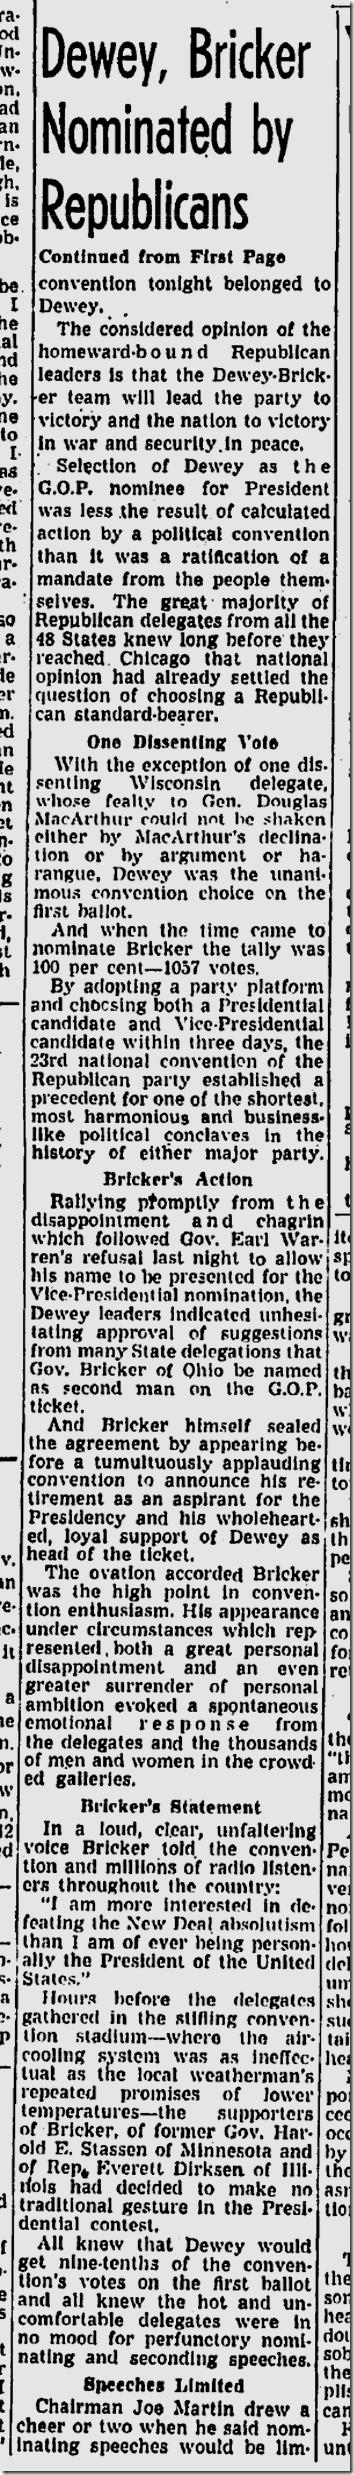 June 29, 1944, Republican Convention